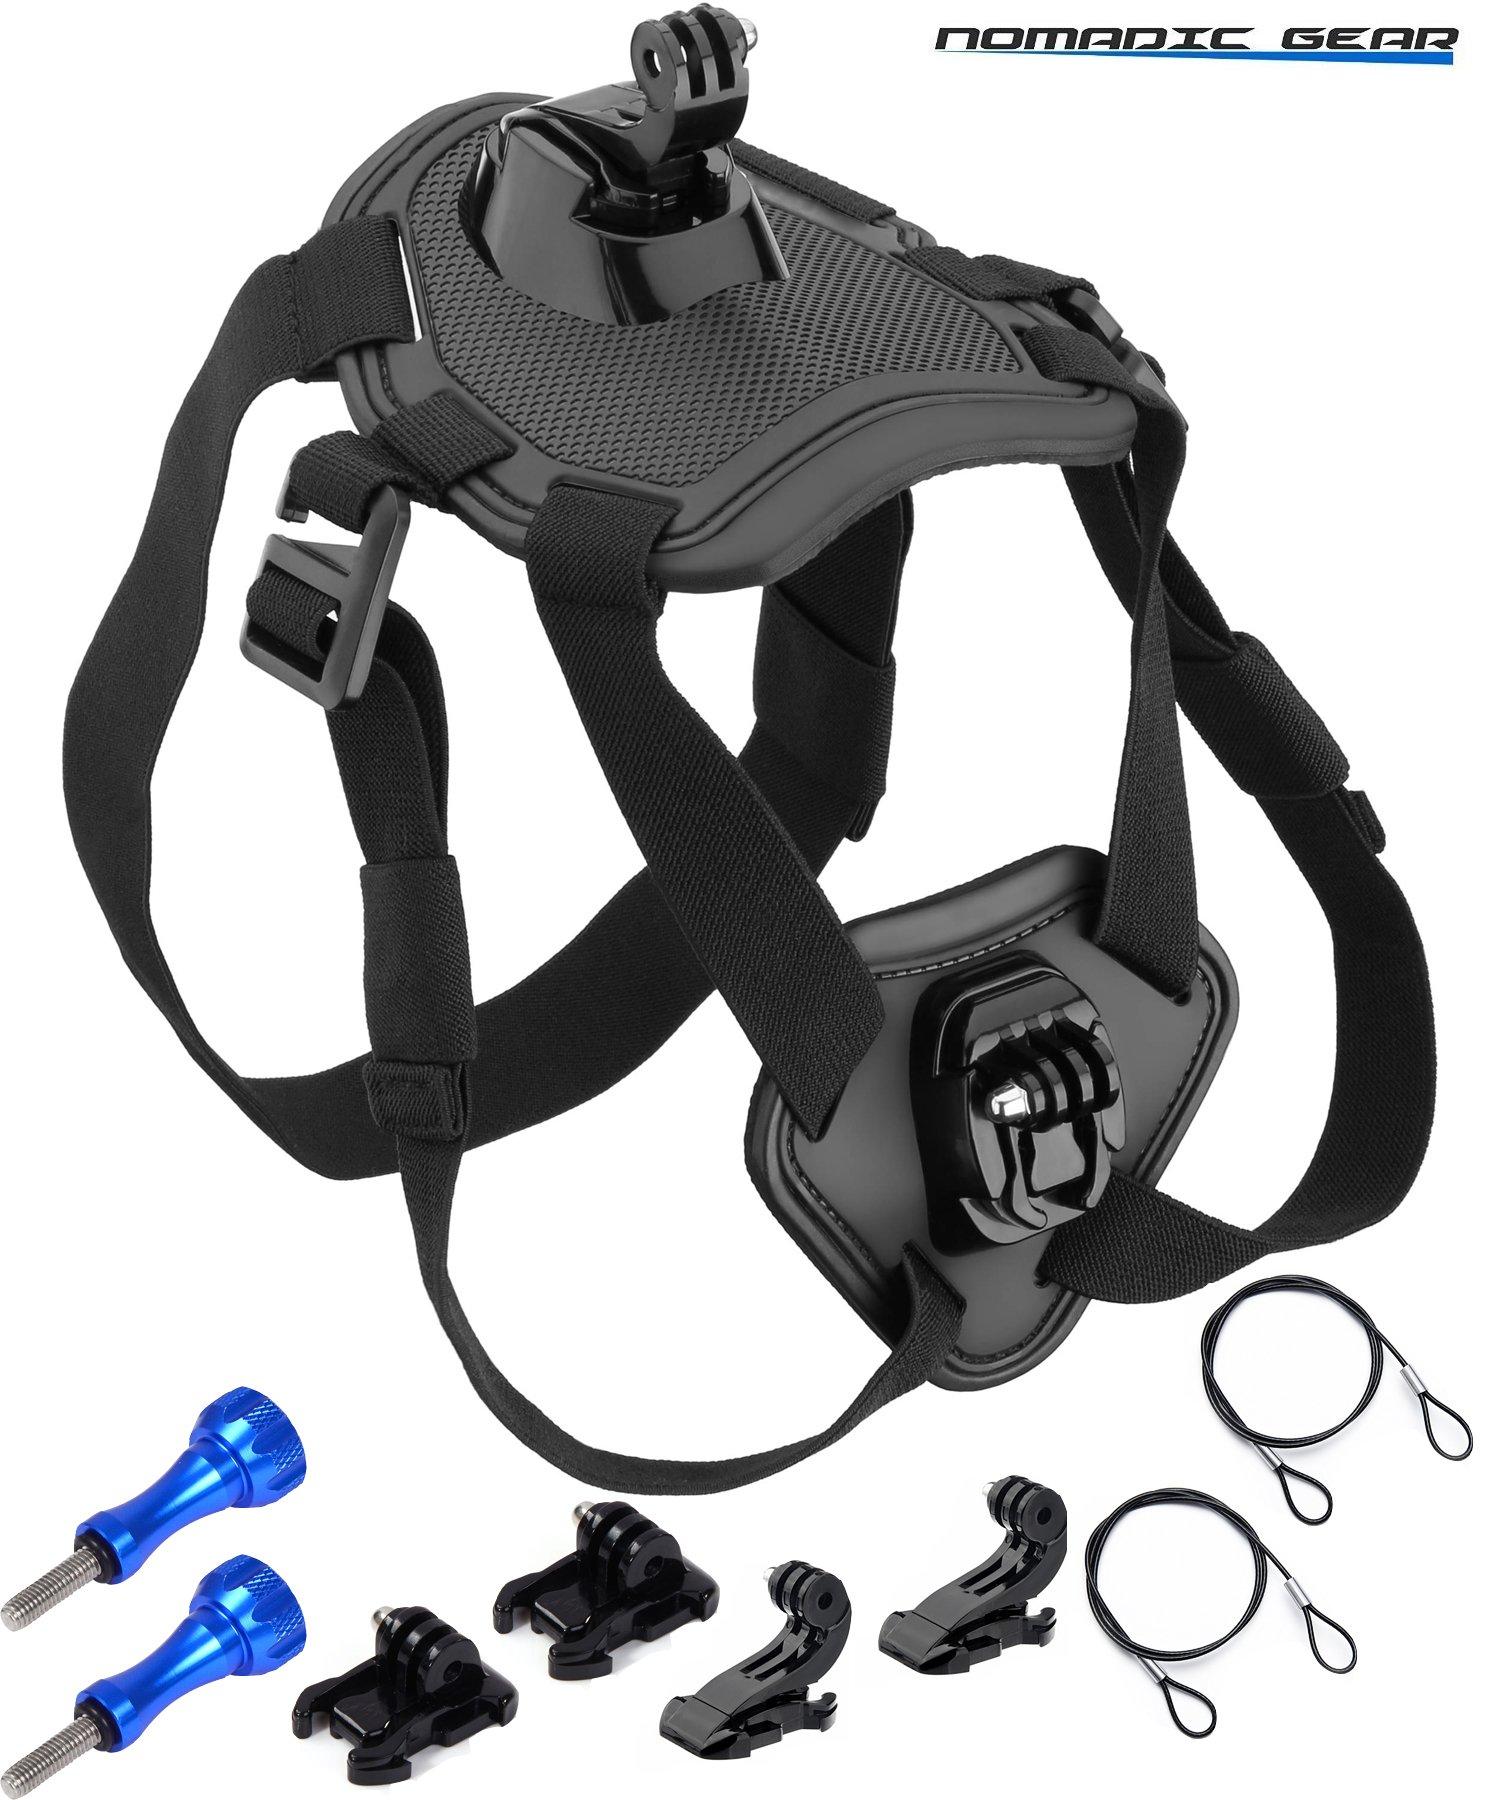 Nomadic Gear Dog Harness Chest Mount for GoPro, Garmin, Ricoh Action Cam, SJCAM, AKASO, Vtin, Cymas, Apeman, Lightdow, ODRVM, Vtin, Pictek, GT Road, Campark, SOOCOO Action Camera